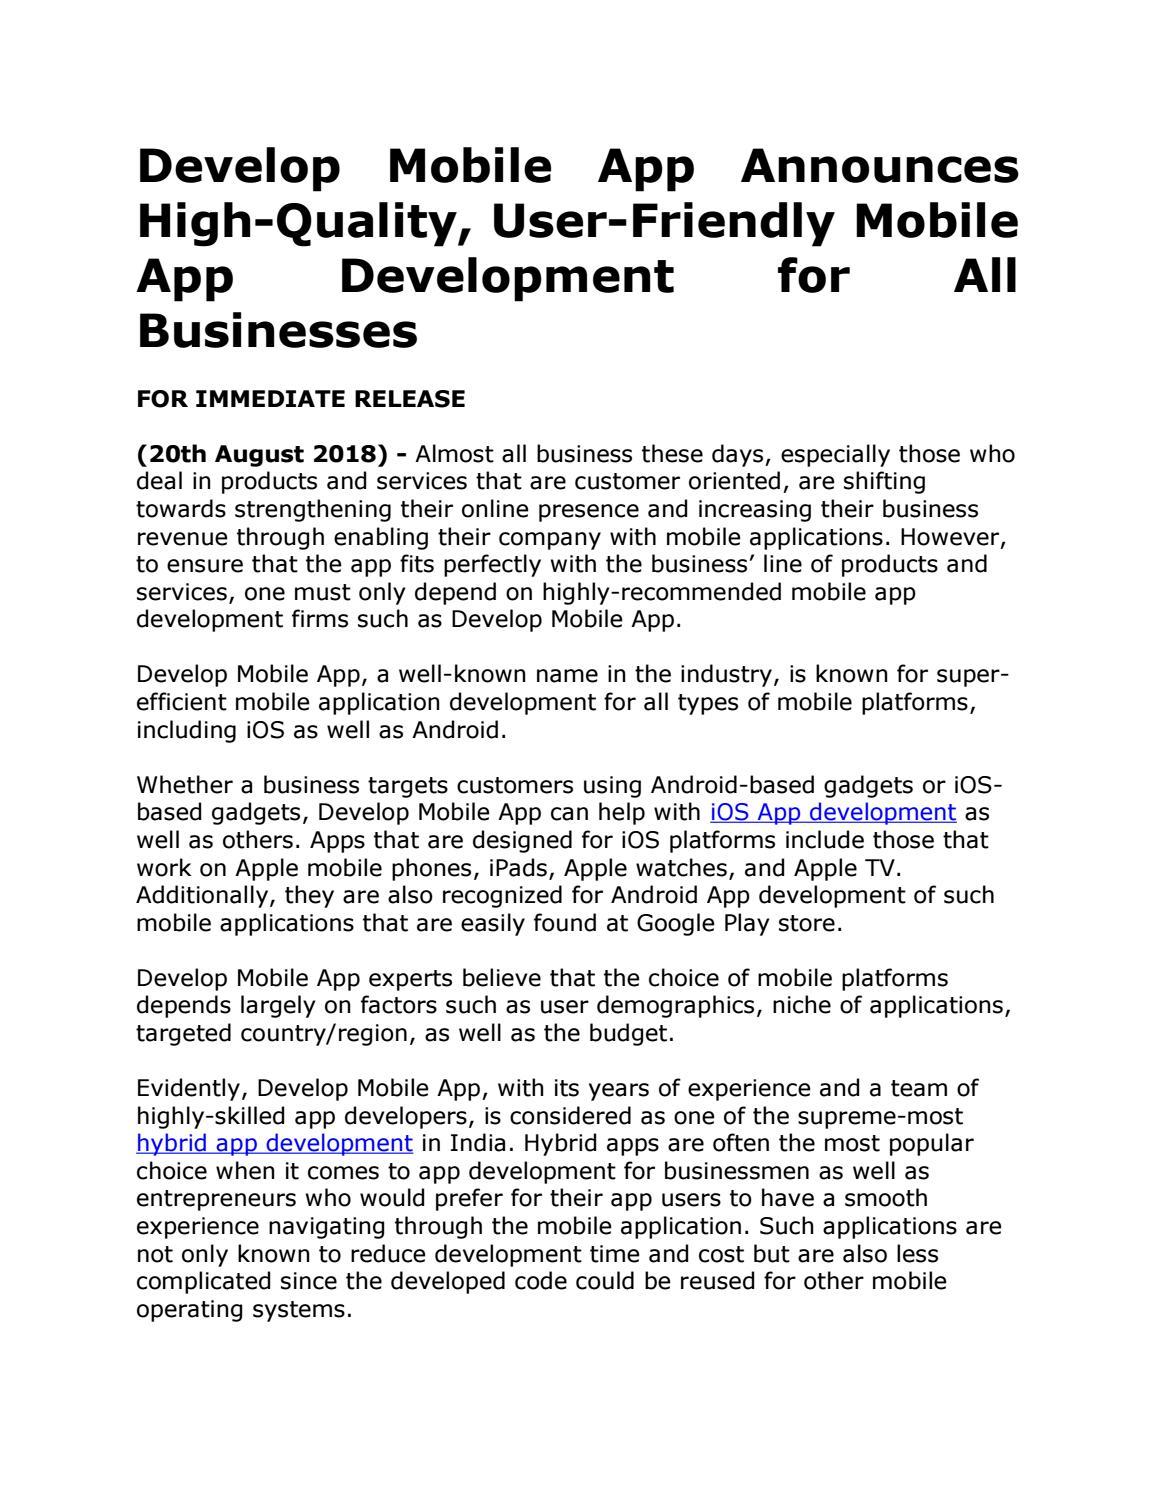 Develop Mobile App Announces High-Quality, User-Friendly Mobile App